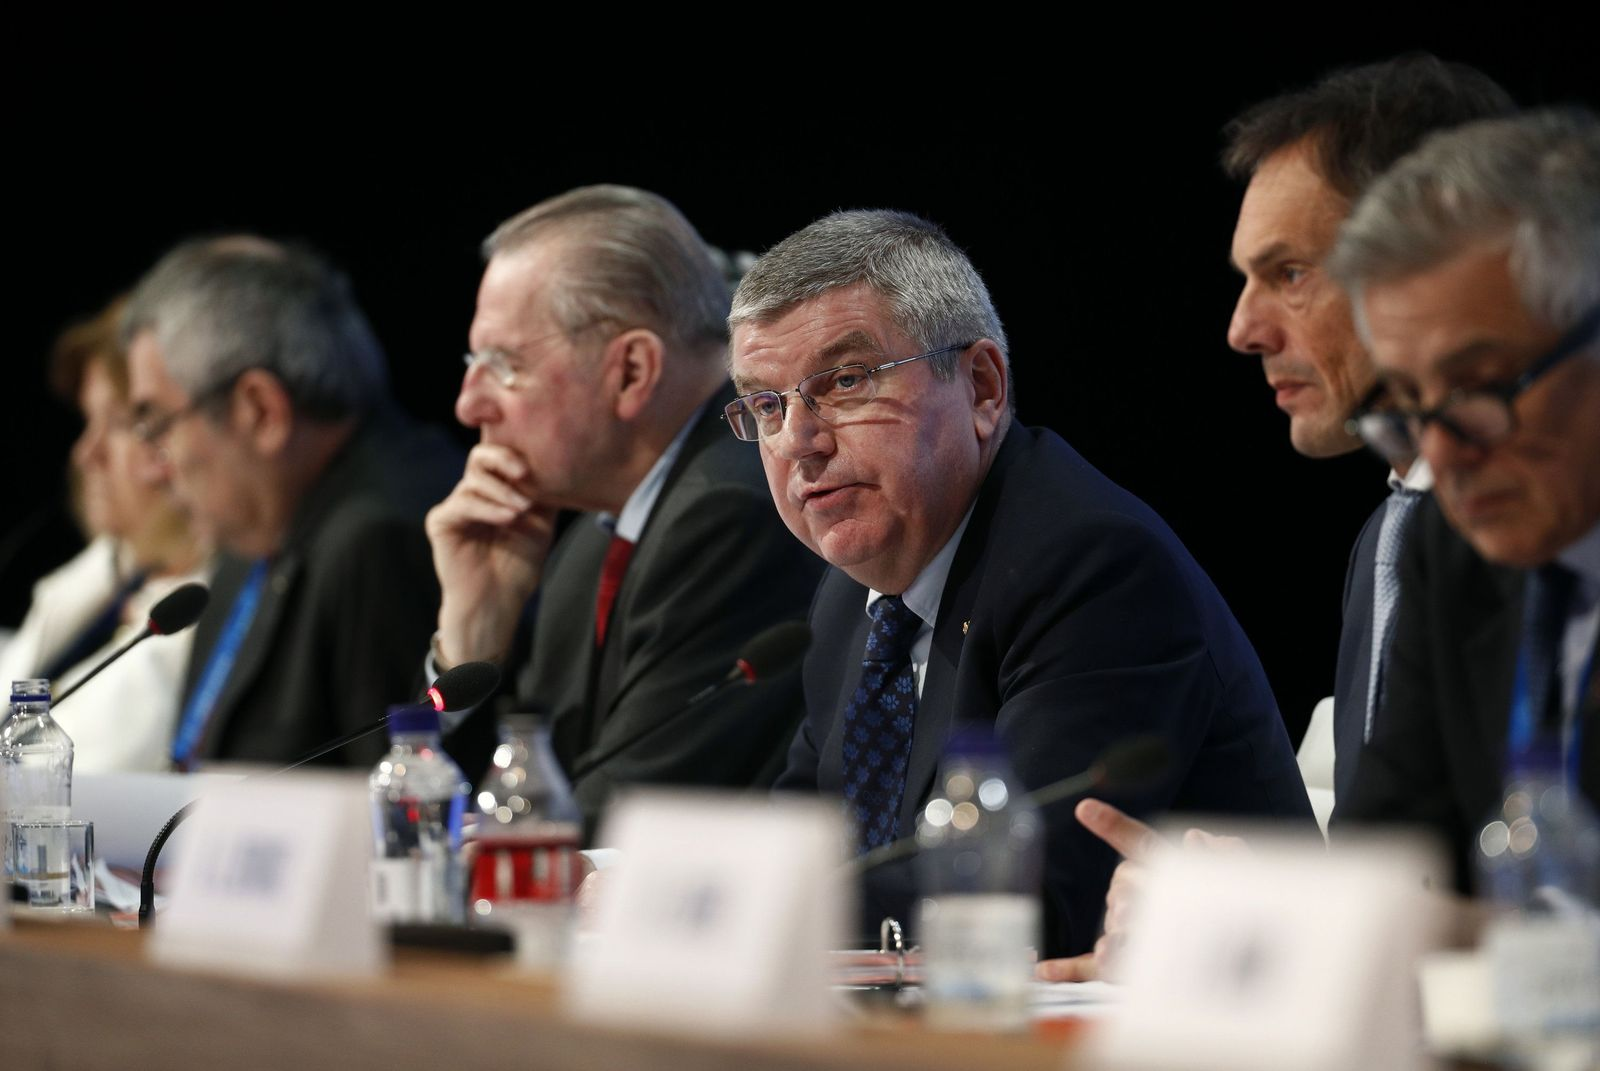 Pyeongchang 2018 - IOC-Versammlung